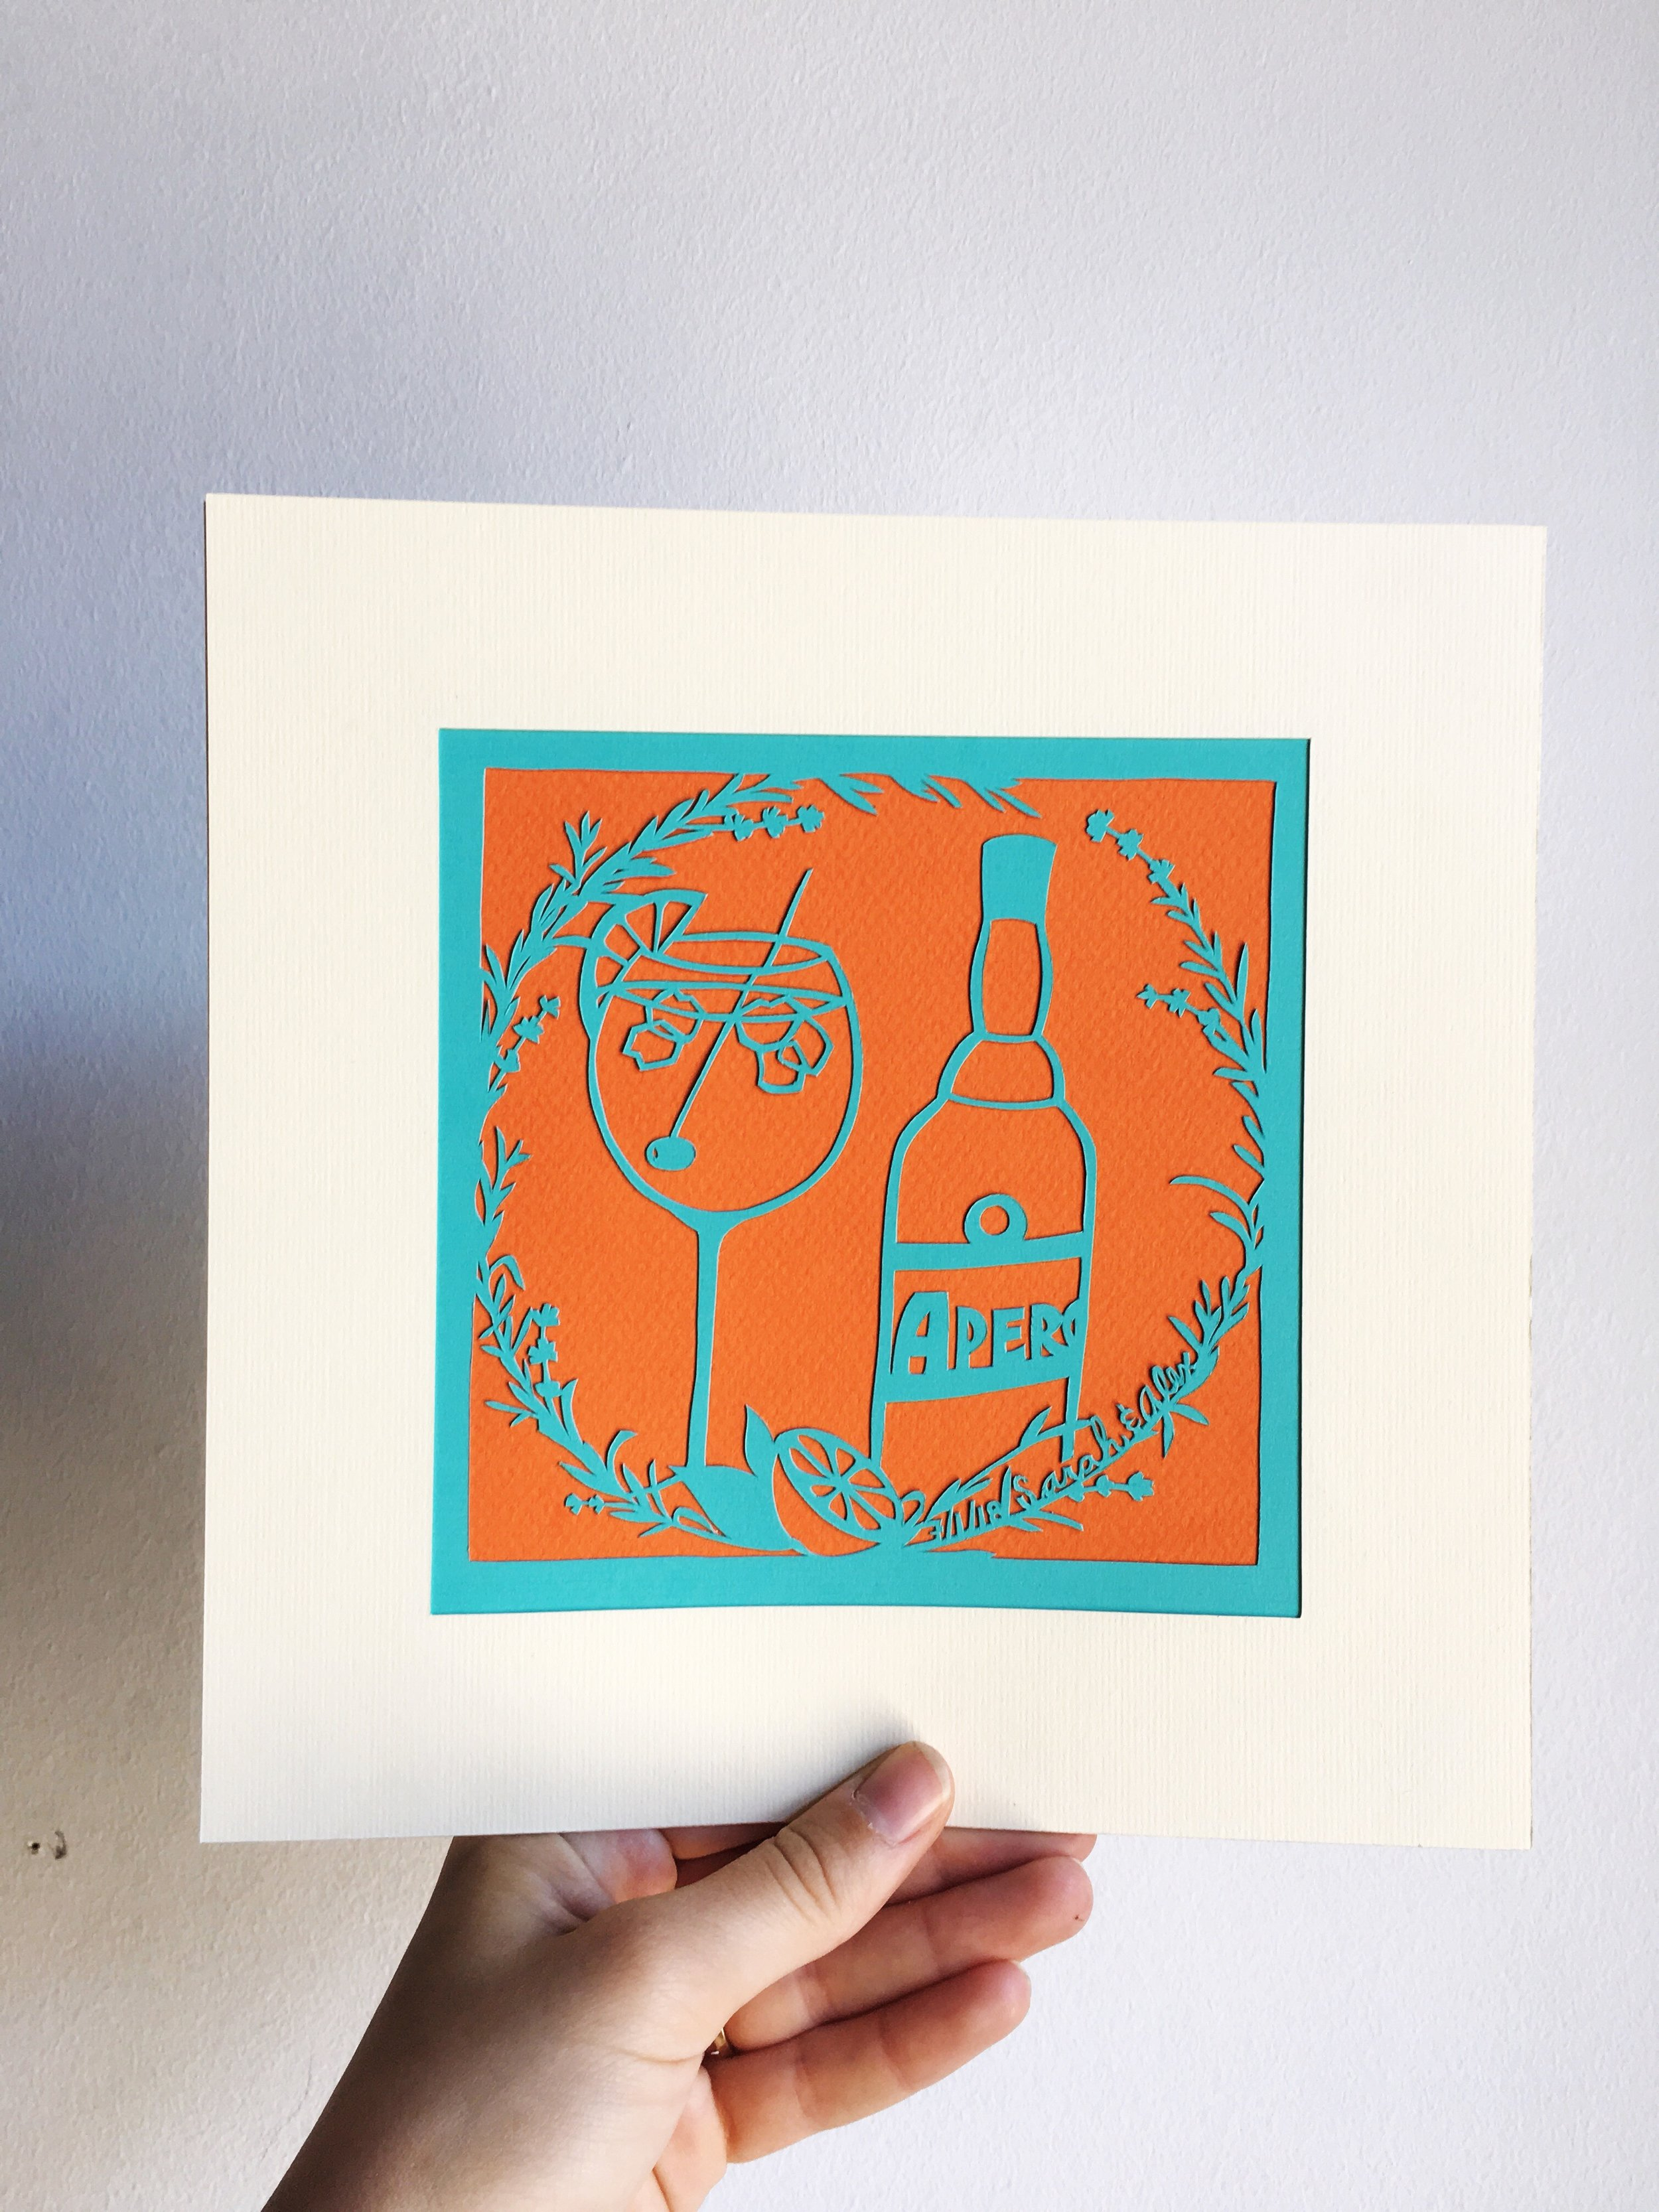 Paper art commission (2018).